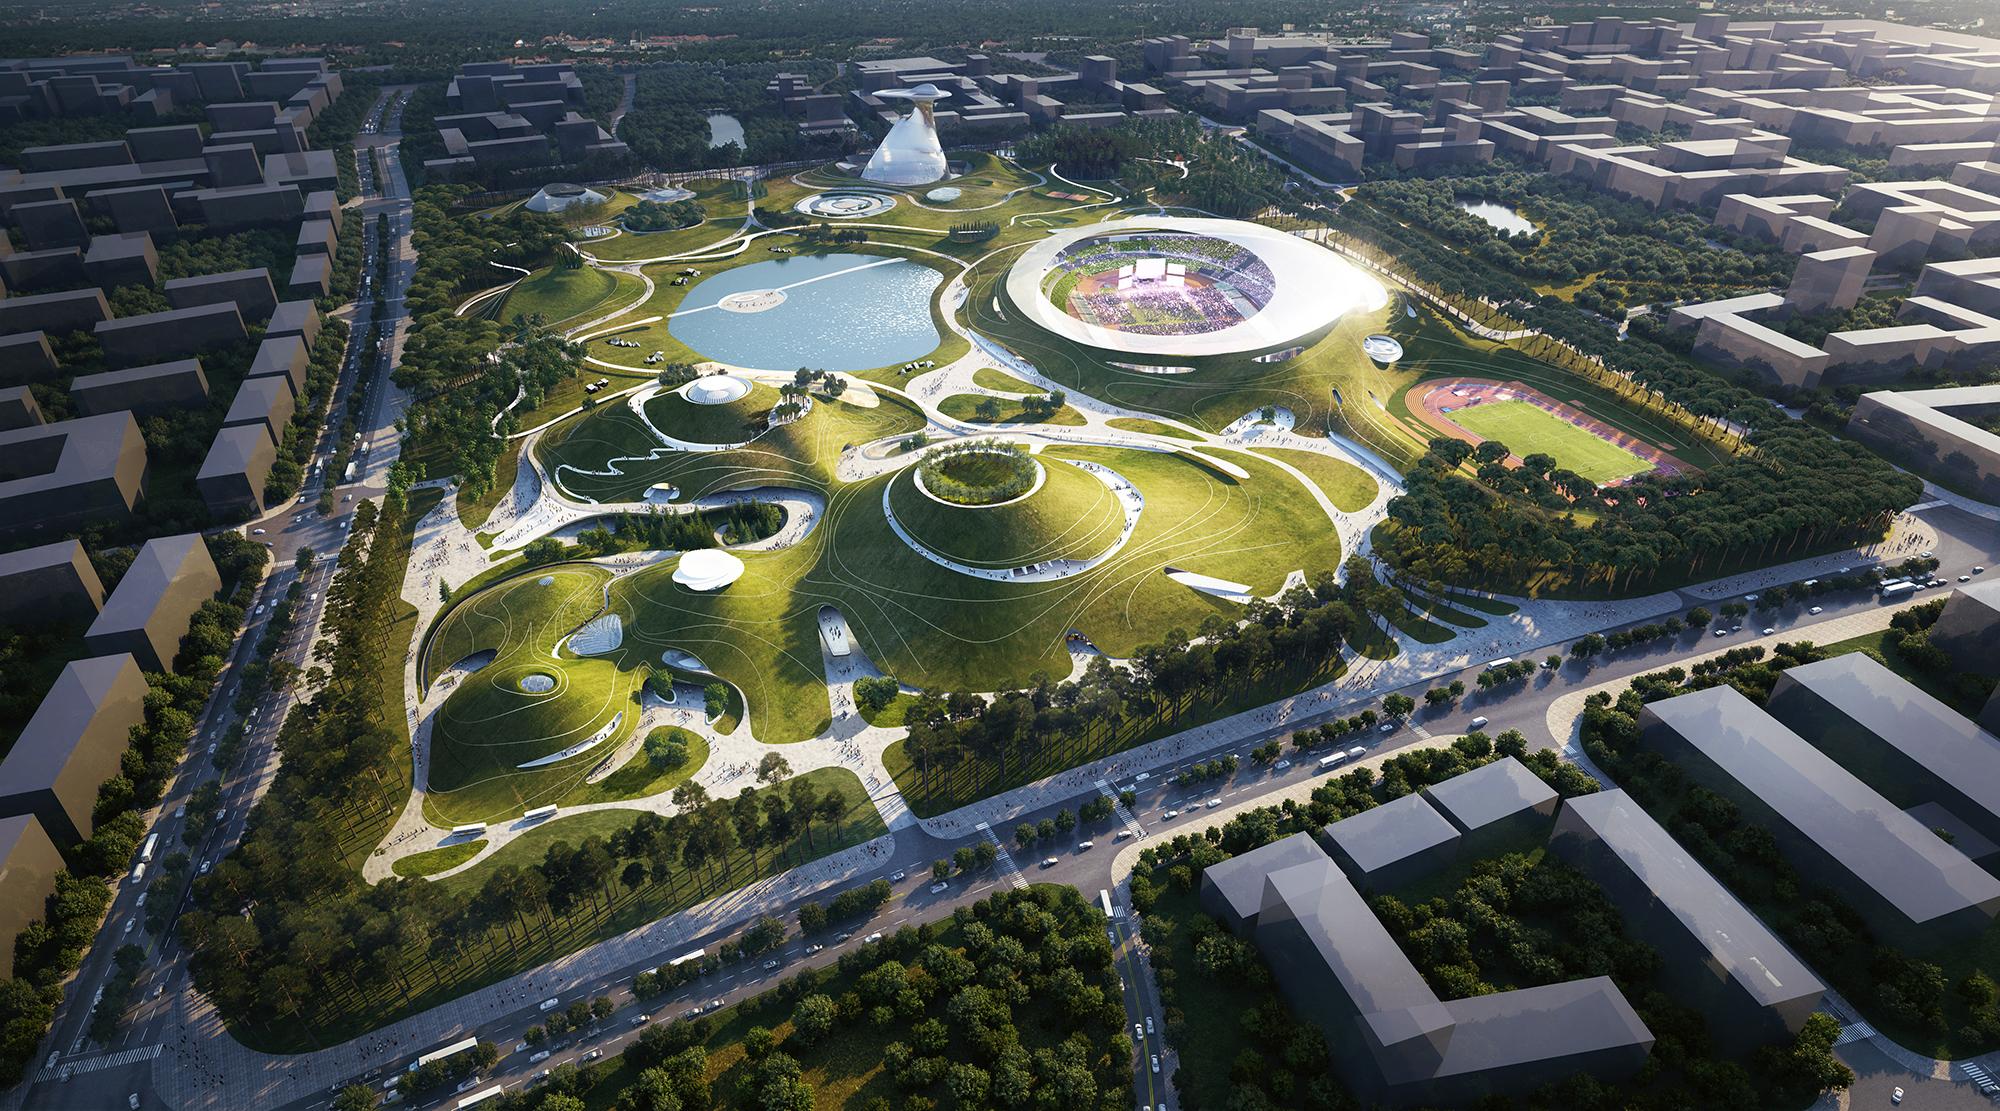 01_MAD_Quzhou Sports Campus